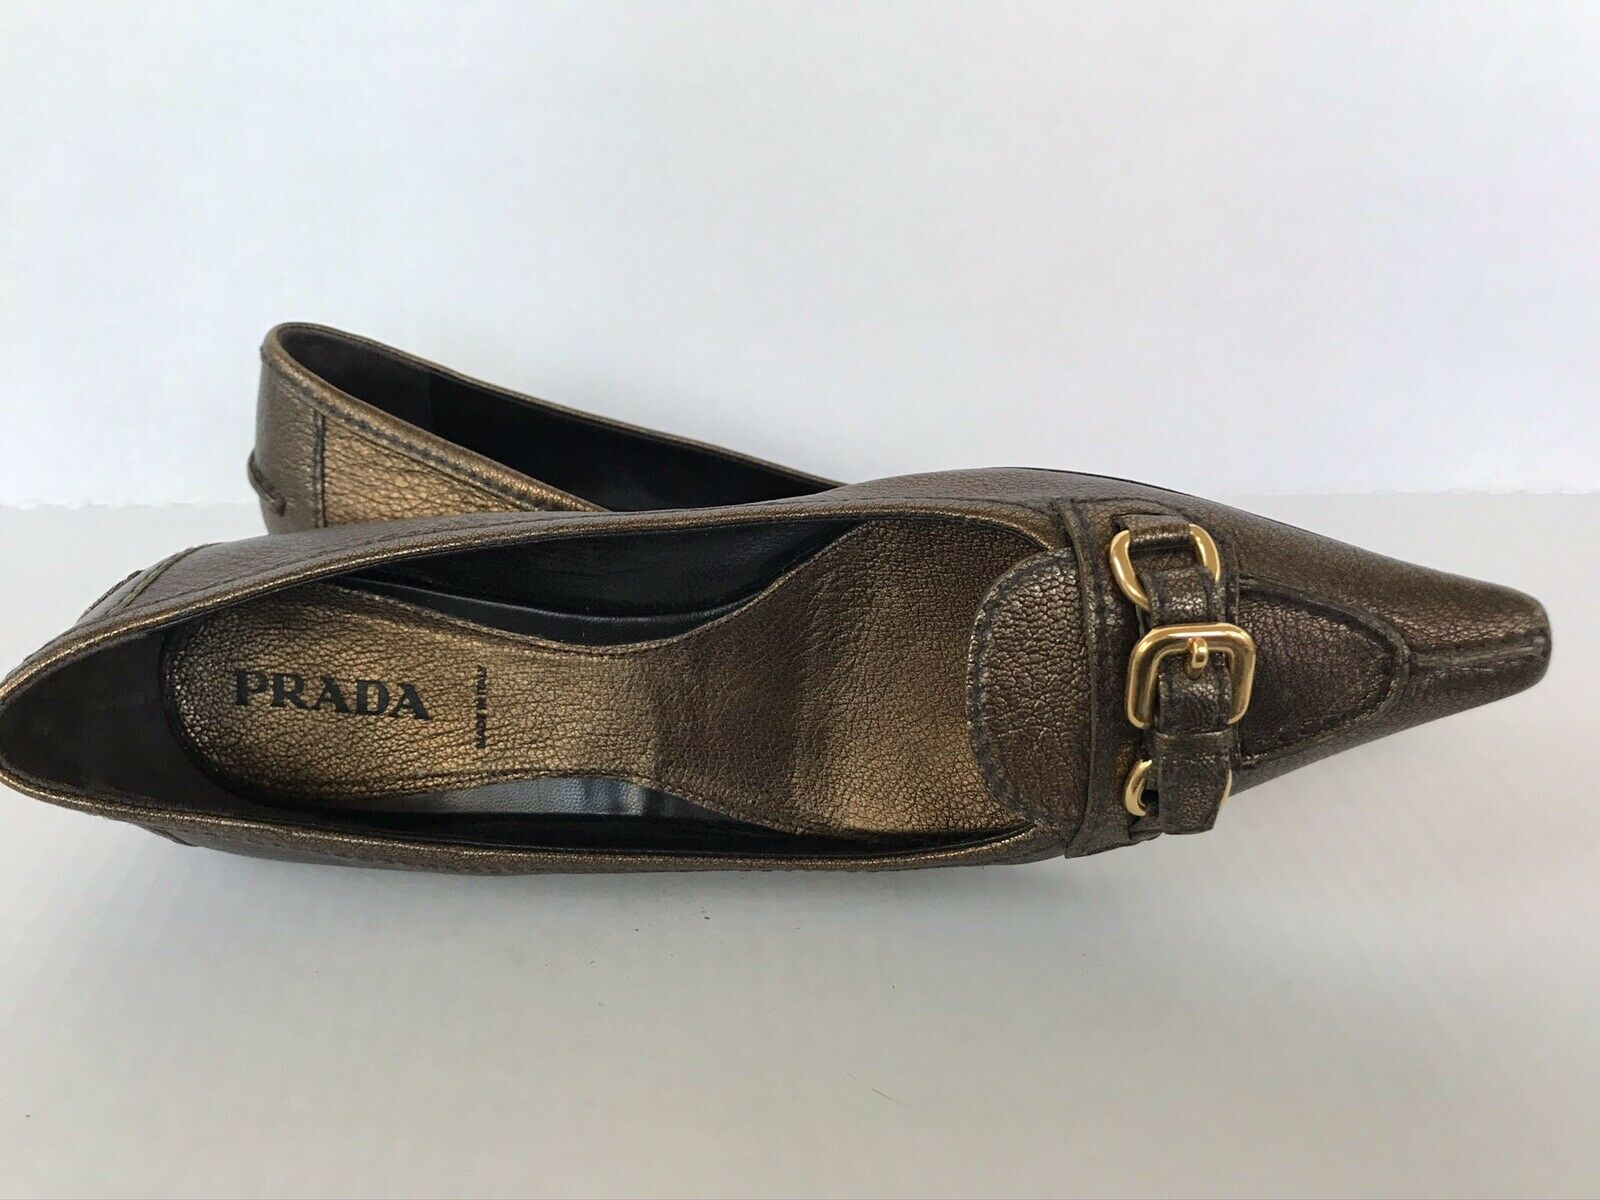 Vintage 1990s Prada Pointy Toe Bronze Leather Buc… - image 2